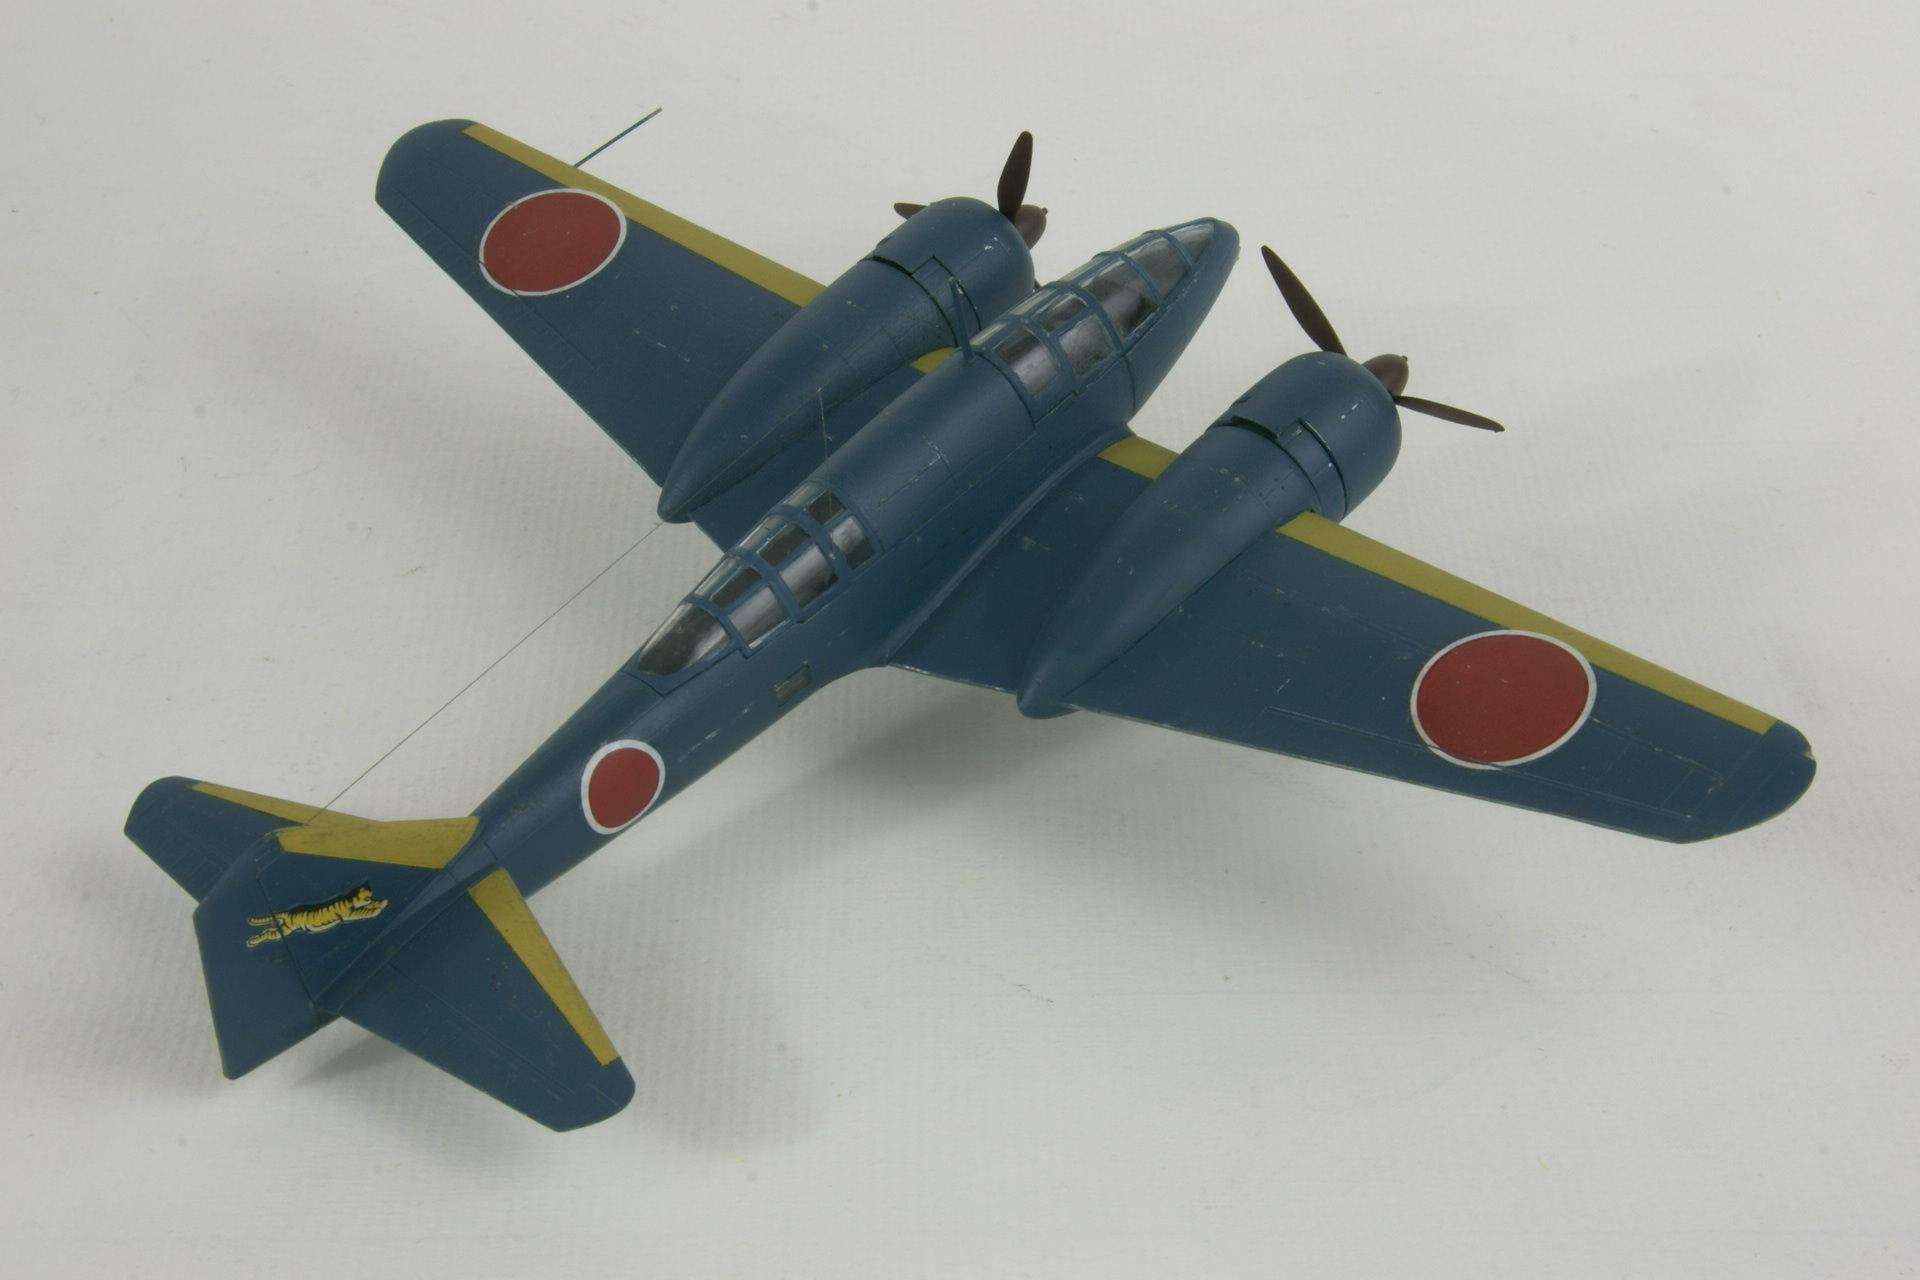 Mitsubishi ki 46 iii dinah 3 1